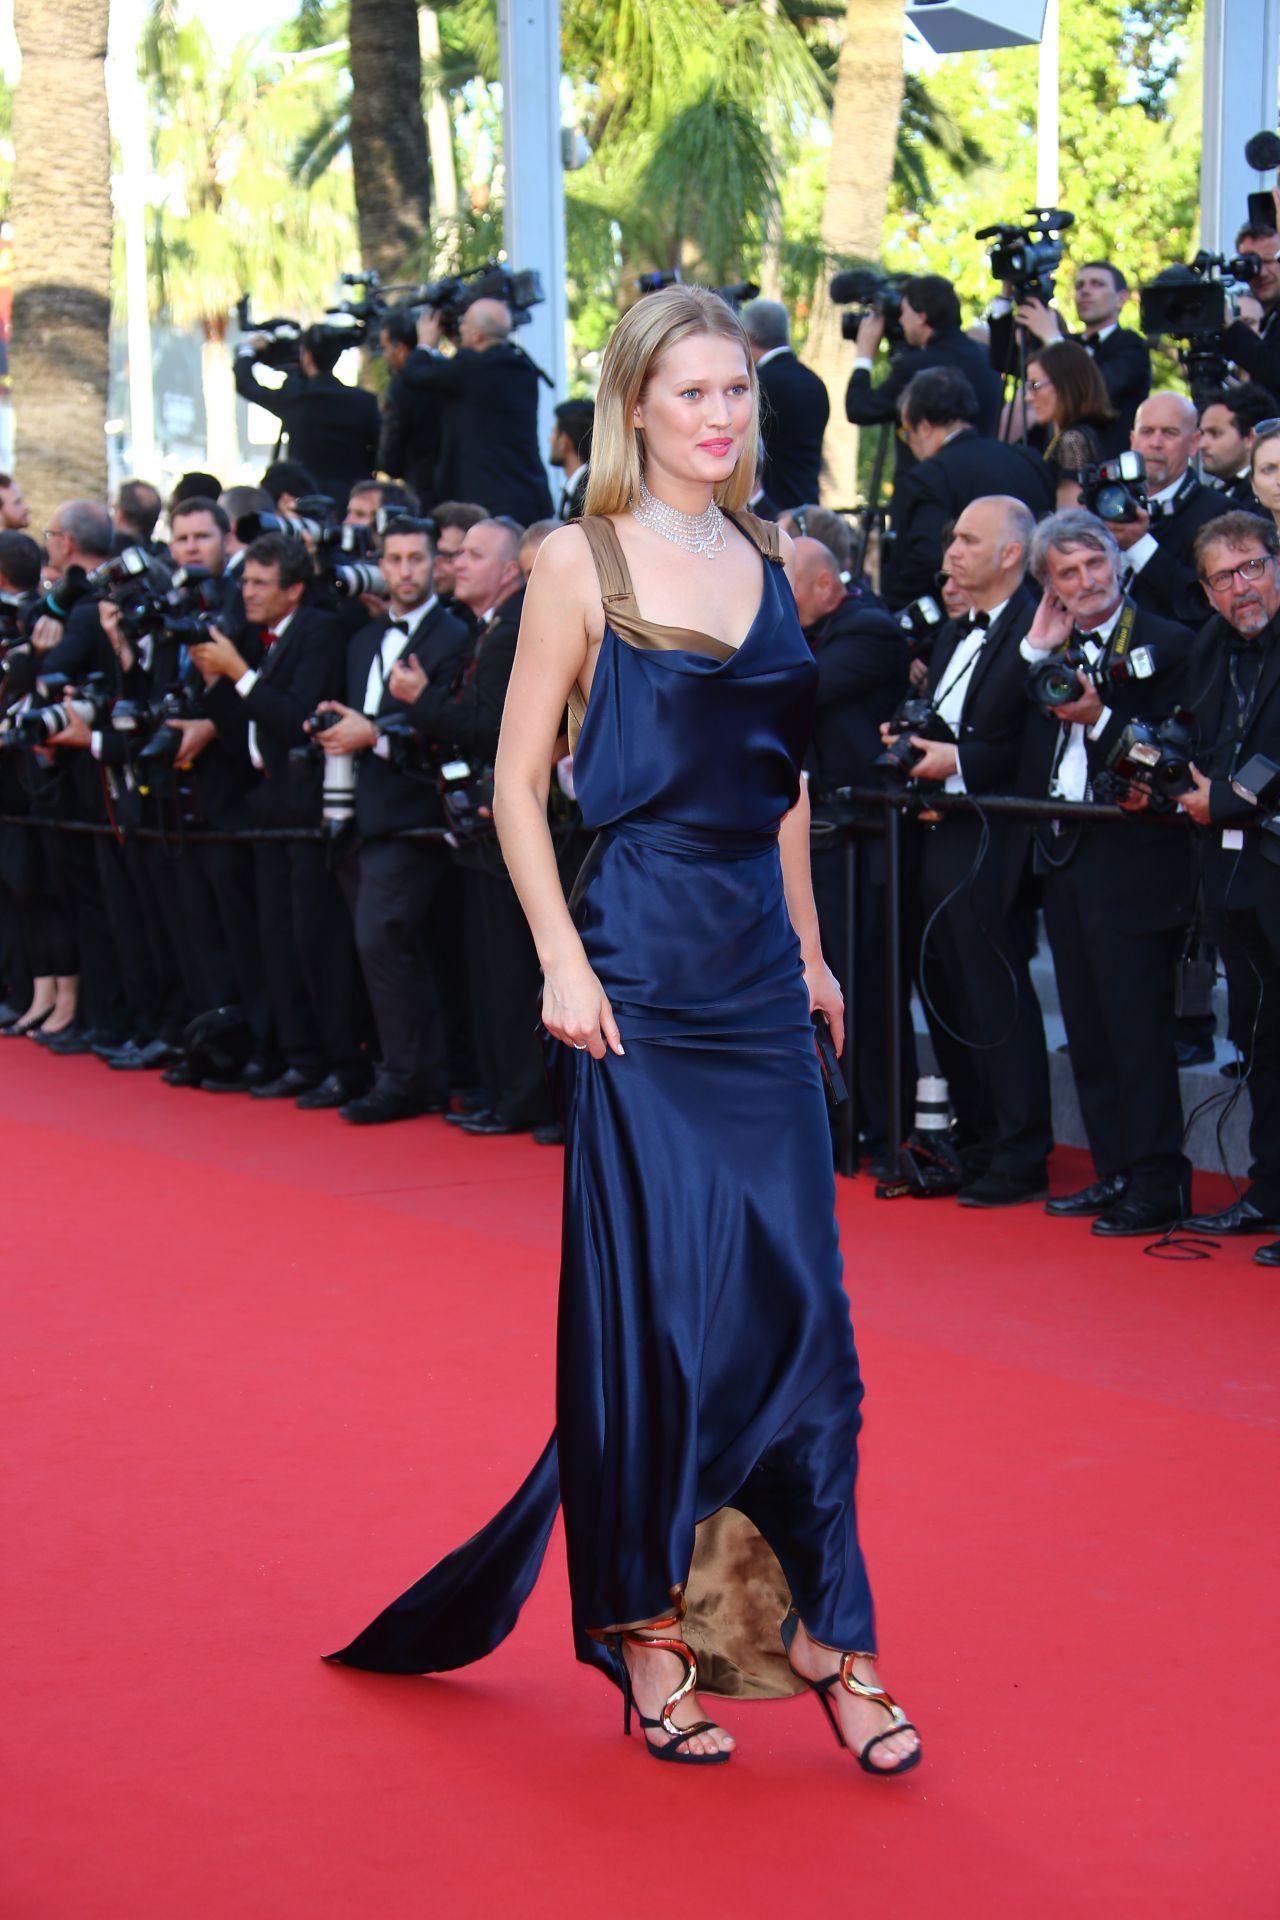 toni-garrn-carol-premiere-2015-cannes-film-festival_15